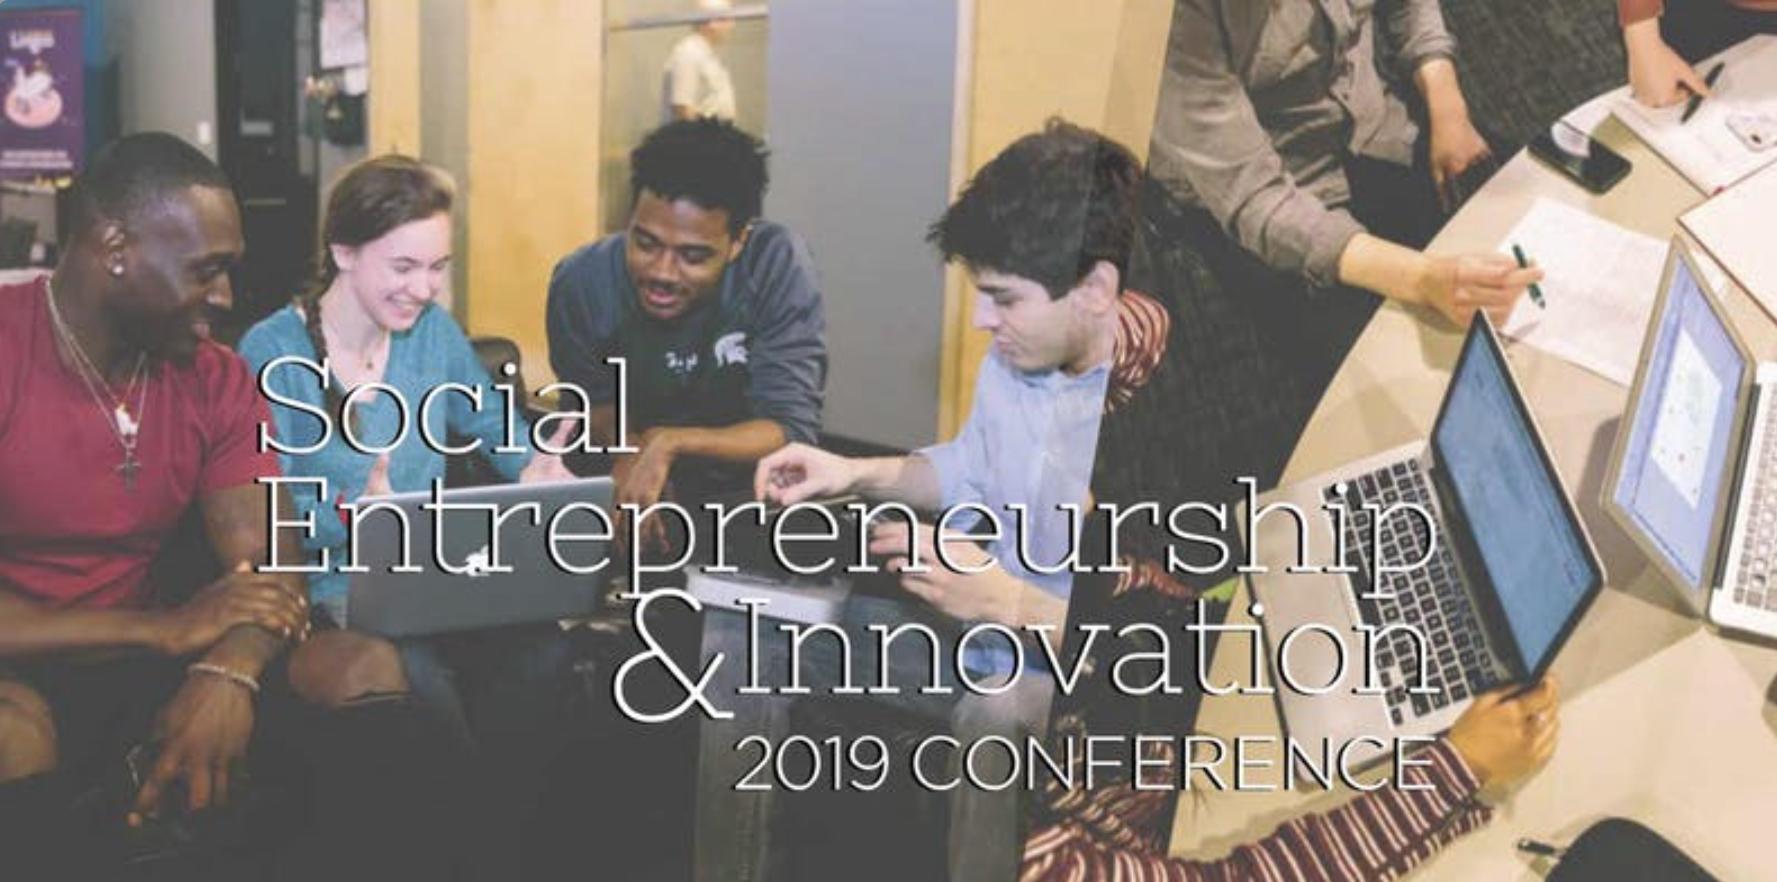 Social Entrepreneurship & Innovation 2019 Conference @ Breslin Student Events Center, Meeting Rooms C&D